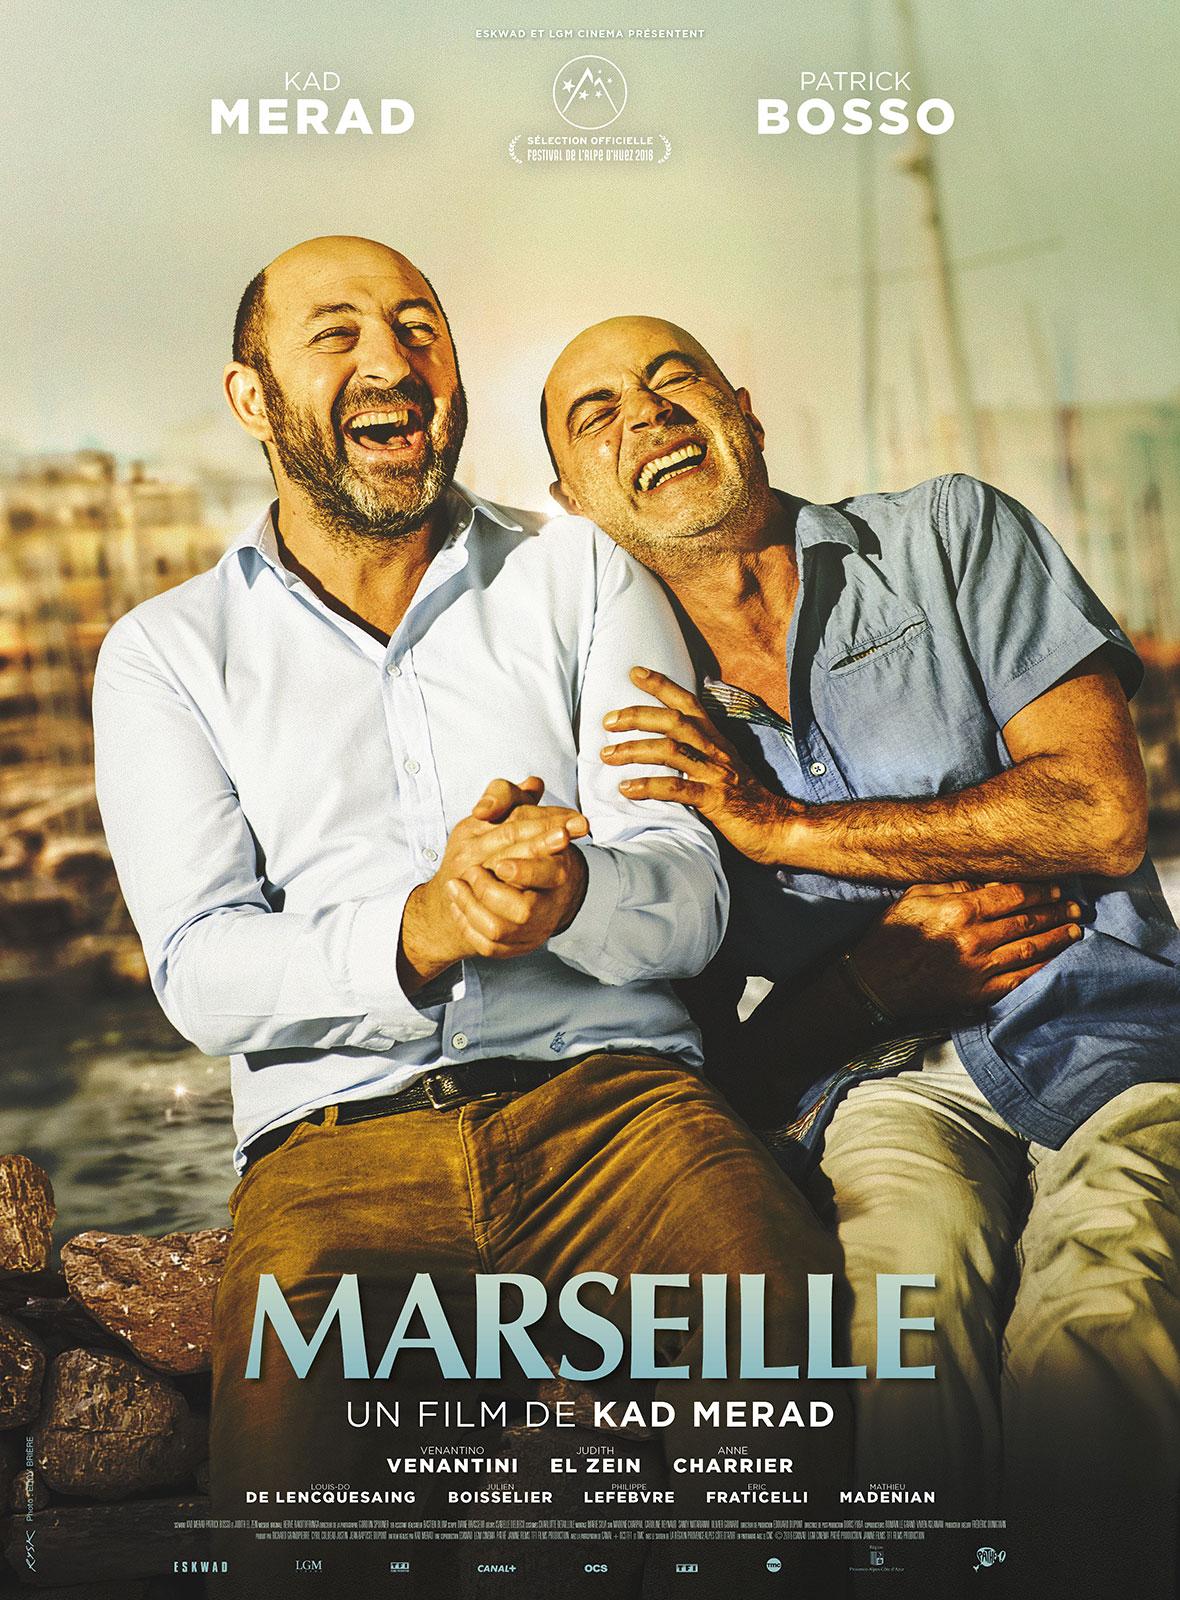 Marseille De Et Avec Kad Merad Pas Vu Pas Deteste